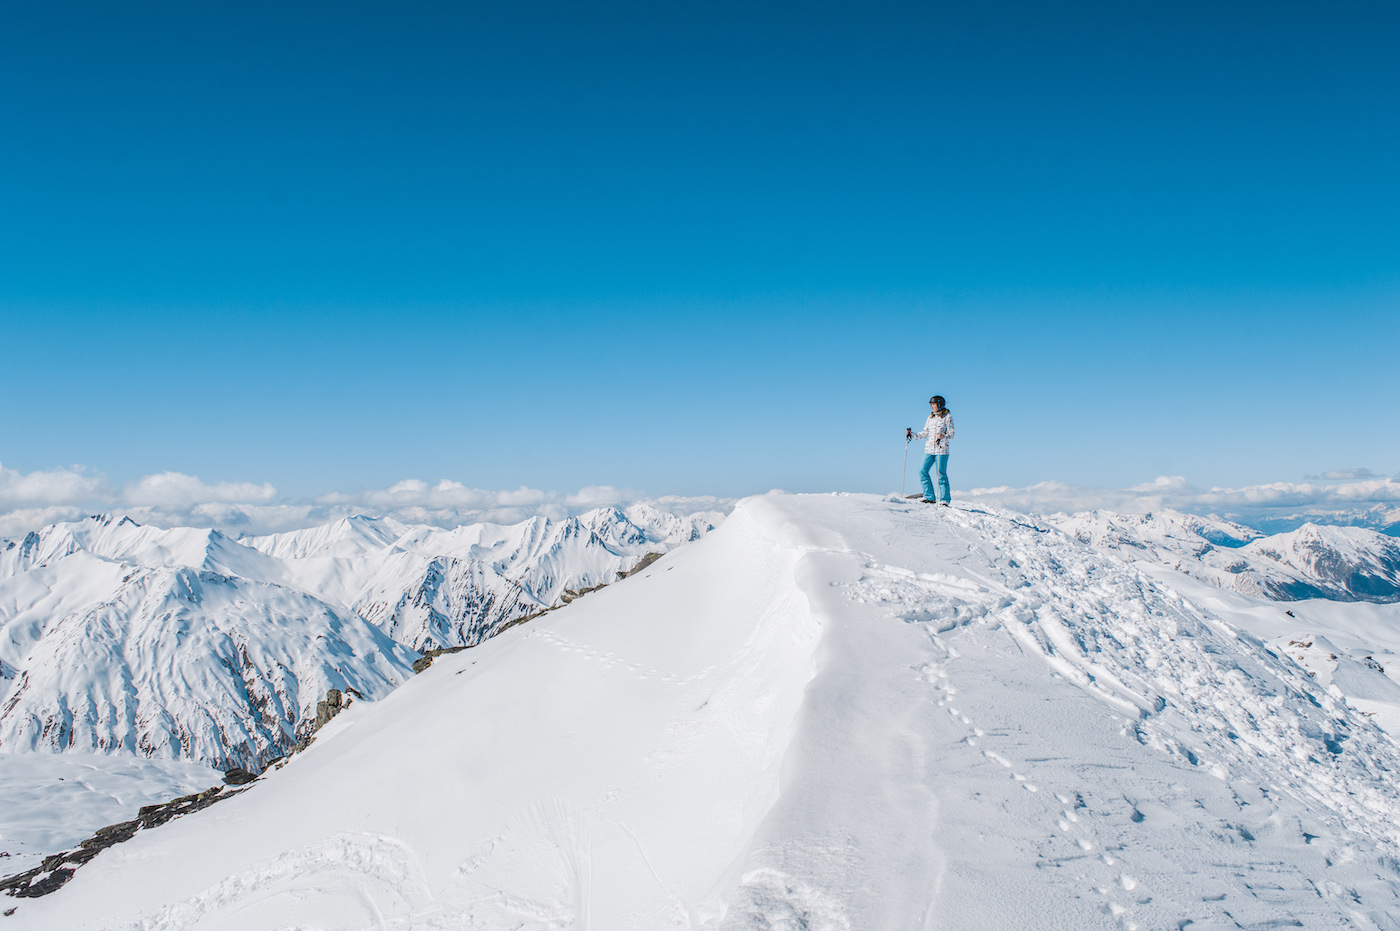 Les menuires wintersporten ervaring Skien